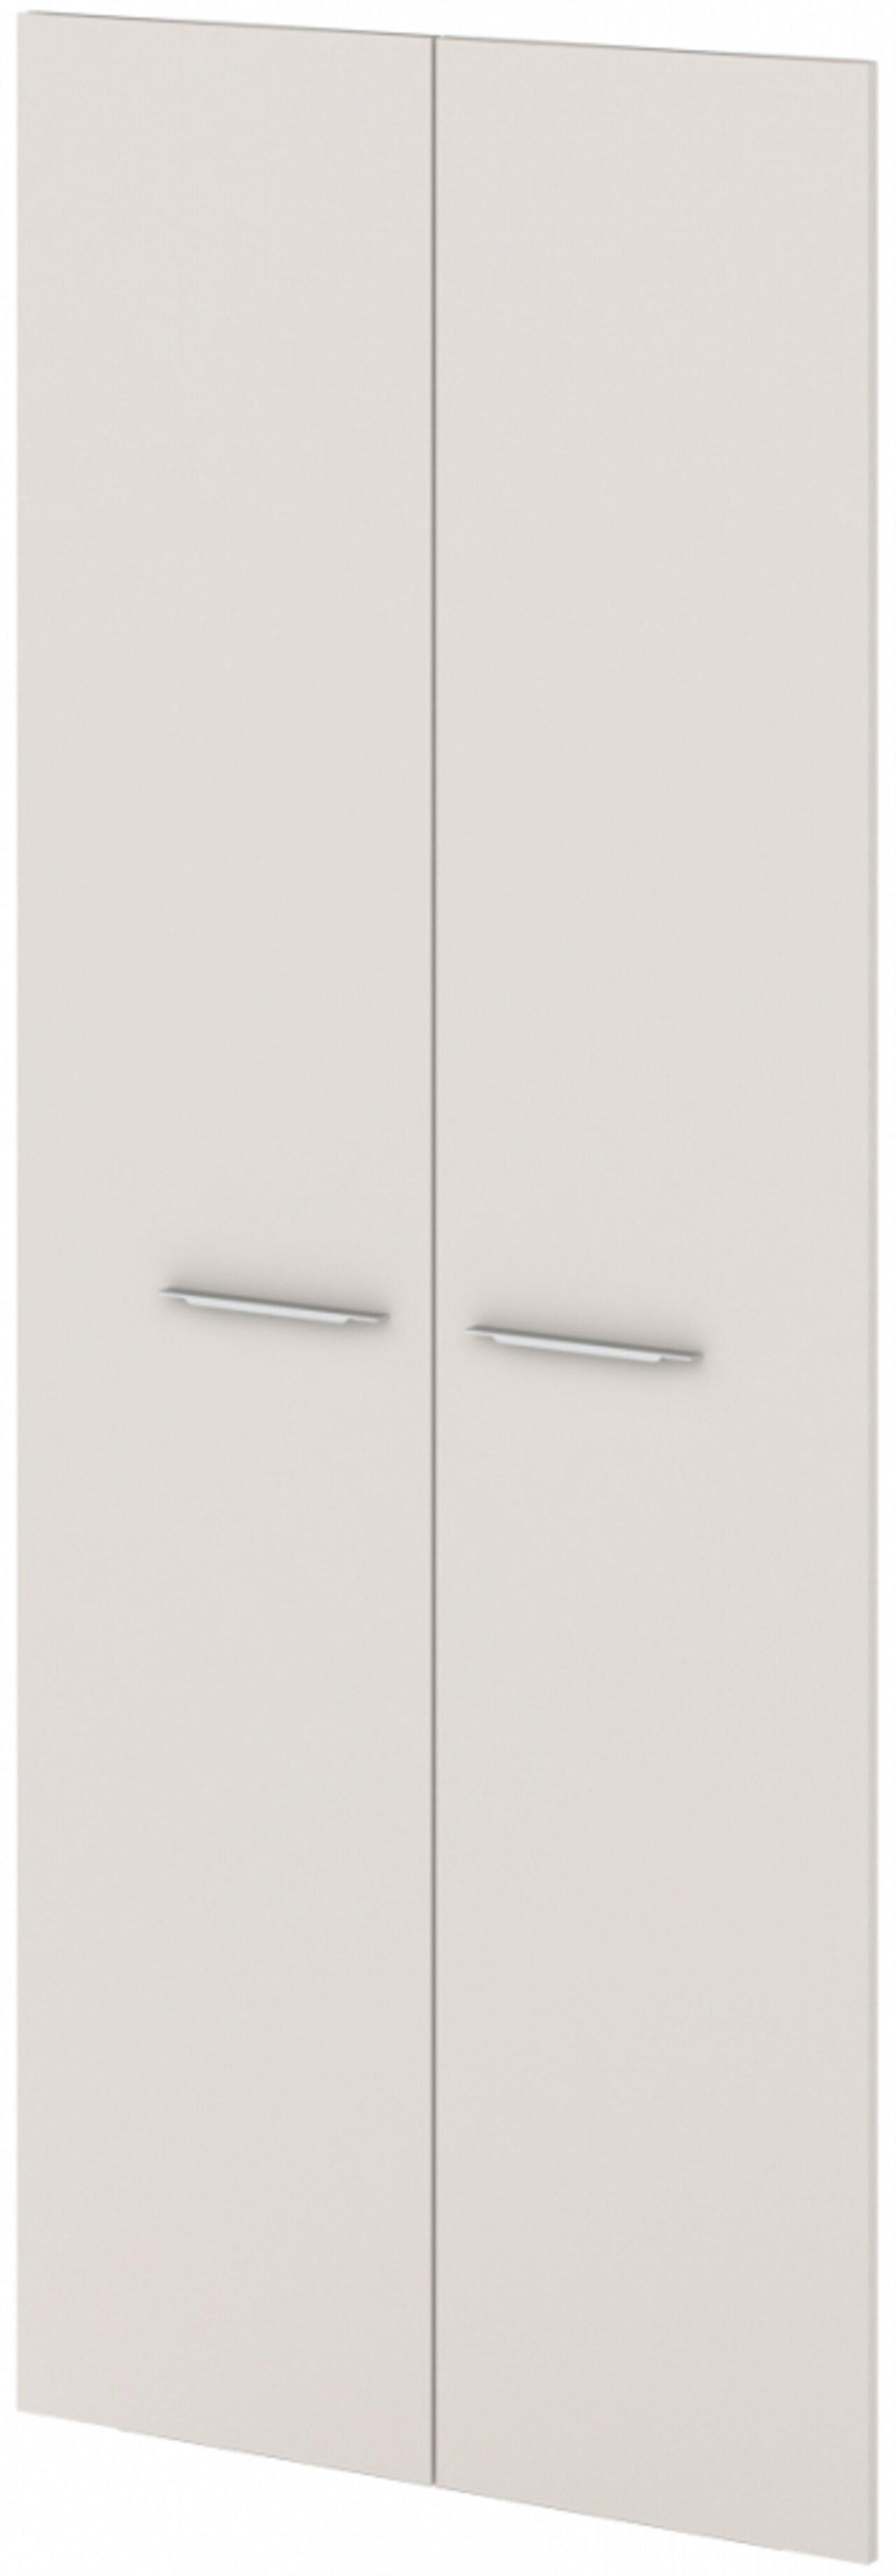 Двери ЛДСП высокие  Grandeza 2x90x221 - фото 1